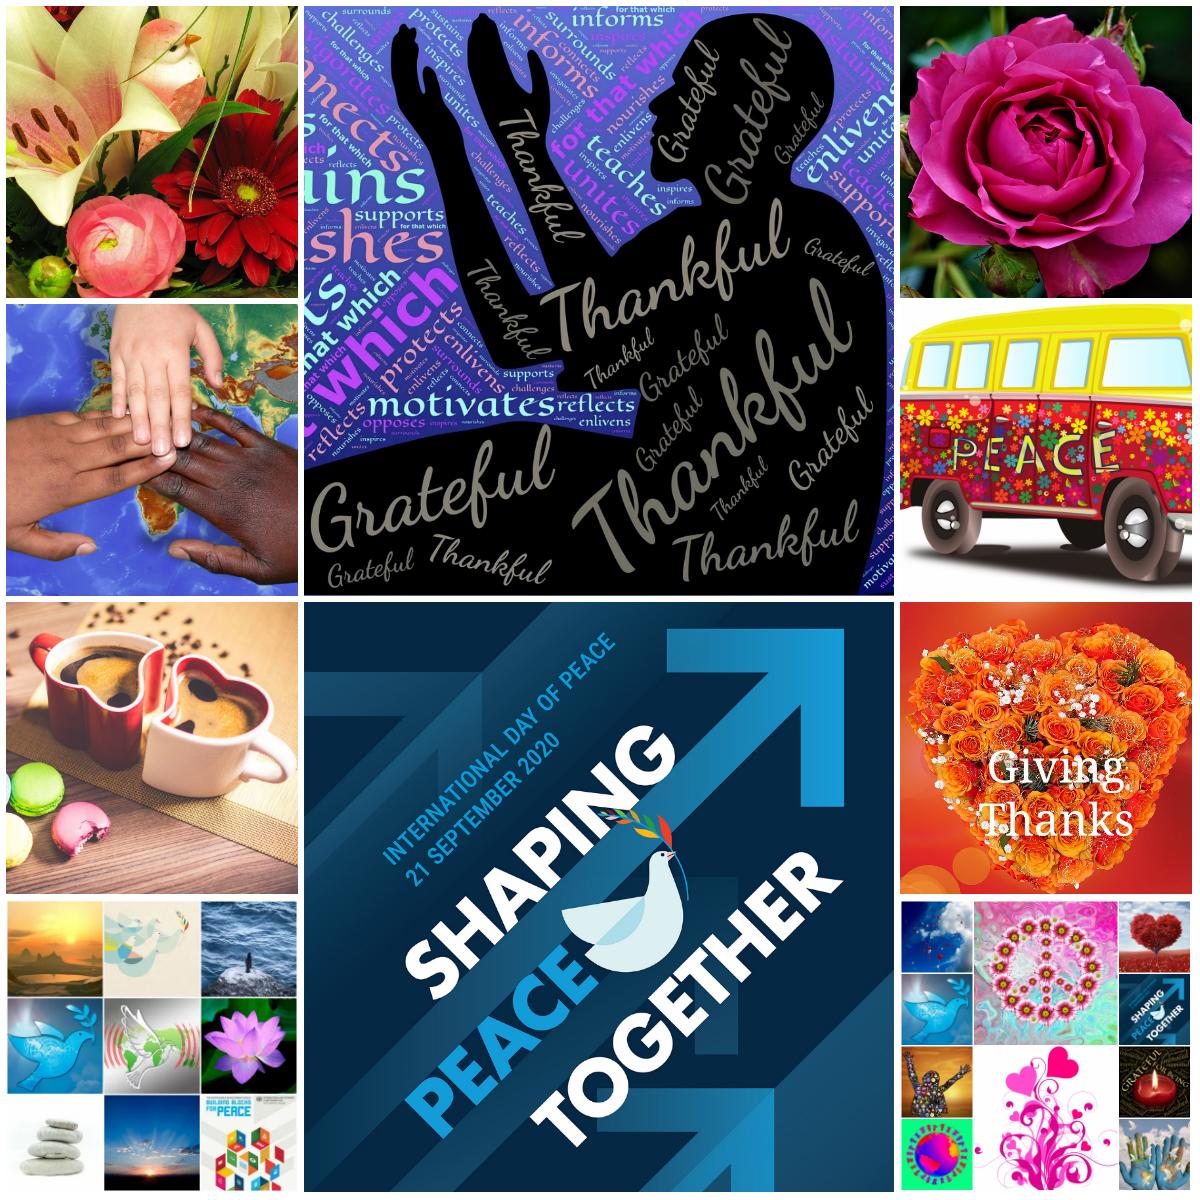 Motivation Mondays: International Day of Peace & World Gratitude Day